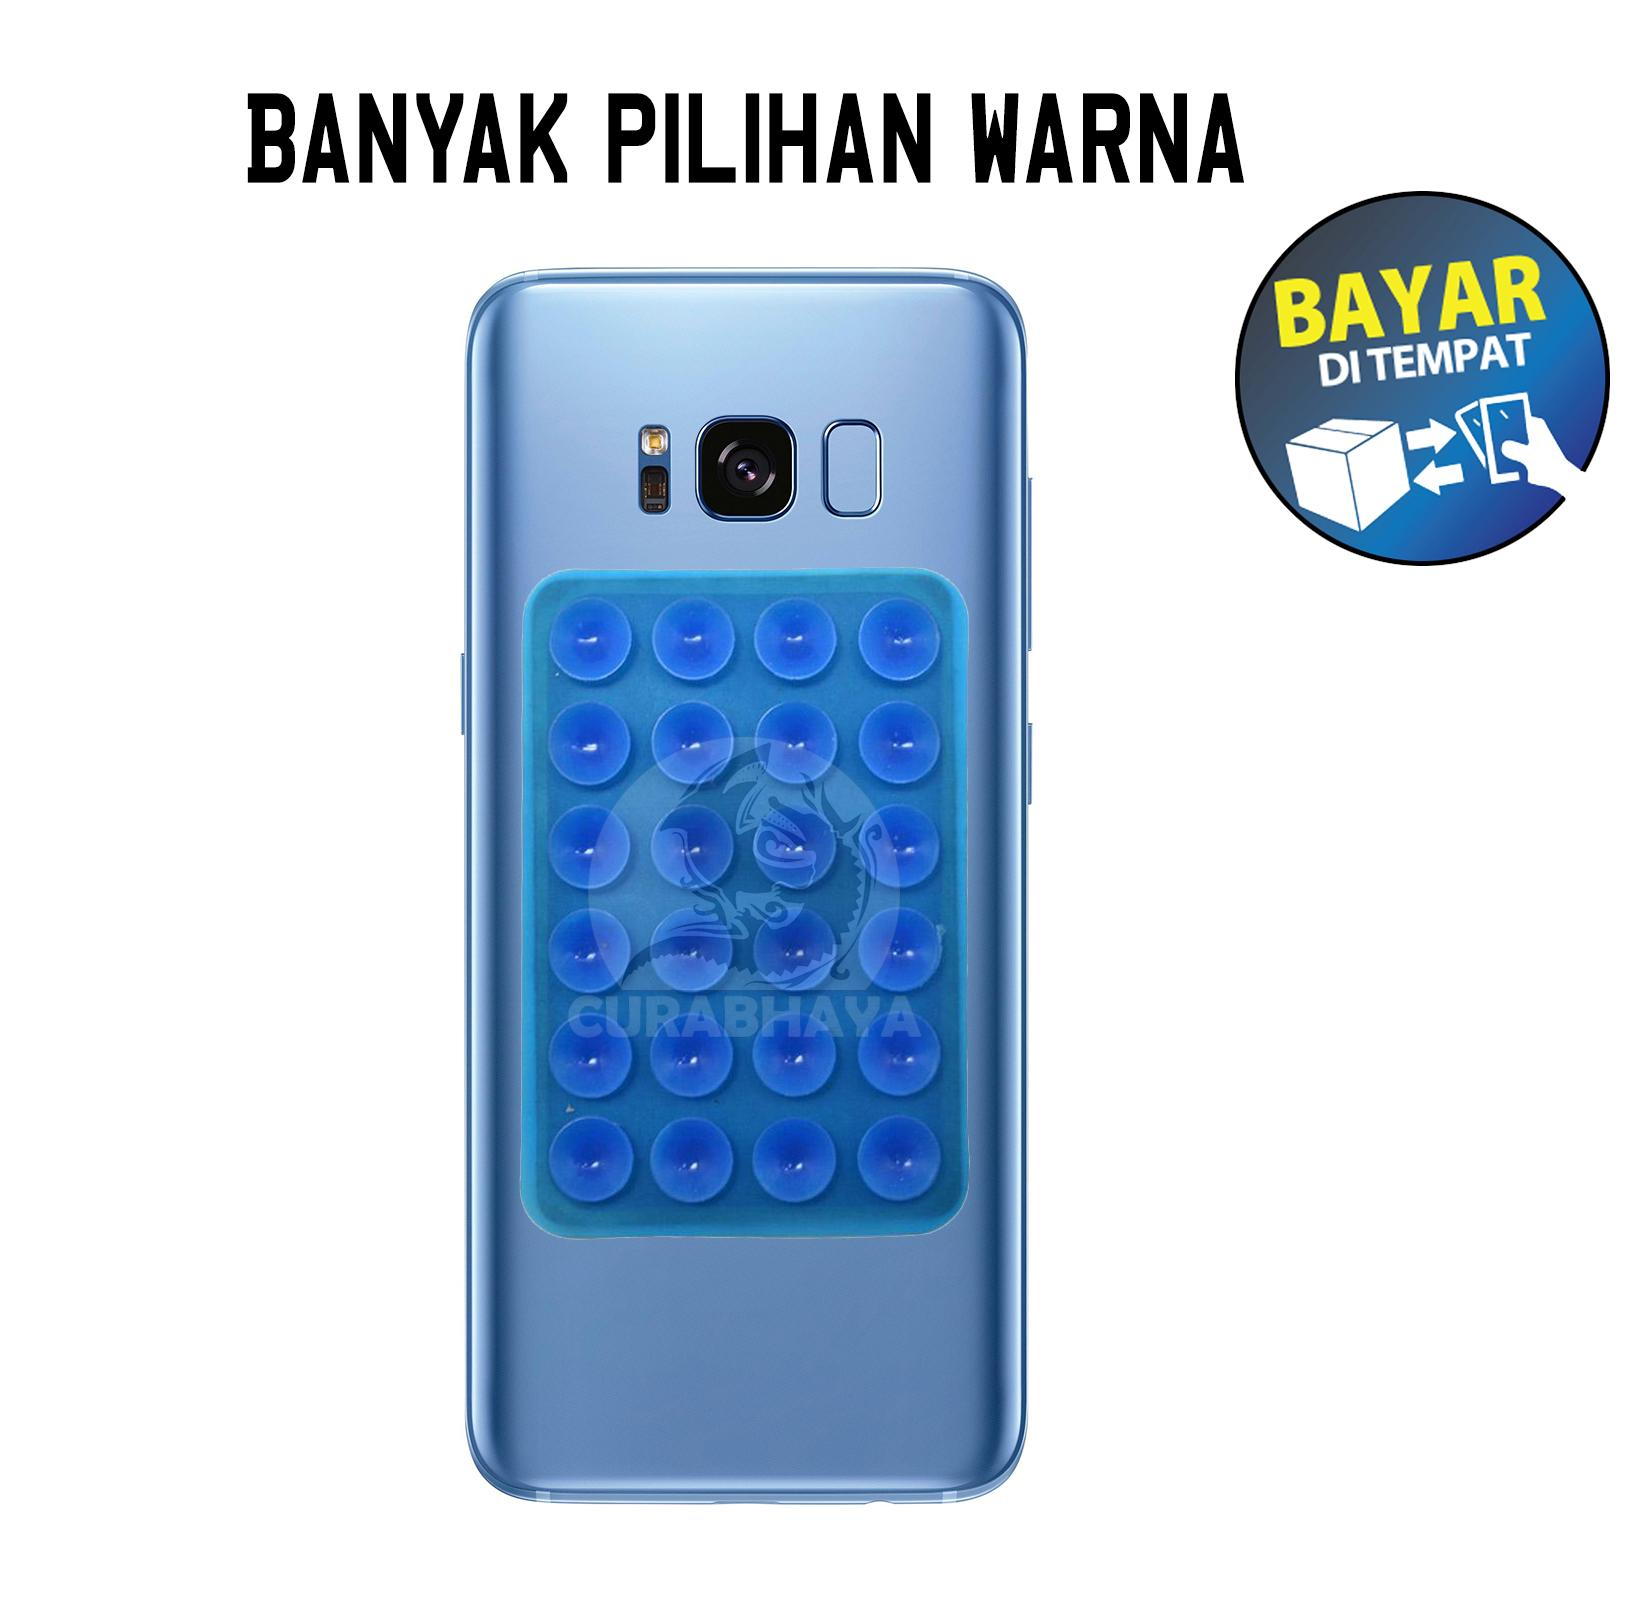 Curabhaya - Tempelan Belakang HP Stand Holder Gurita Universal 24 Tentakel Perekat Vacum Handphone